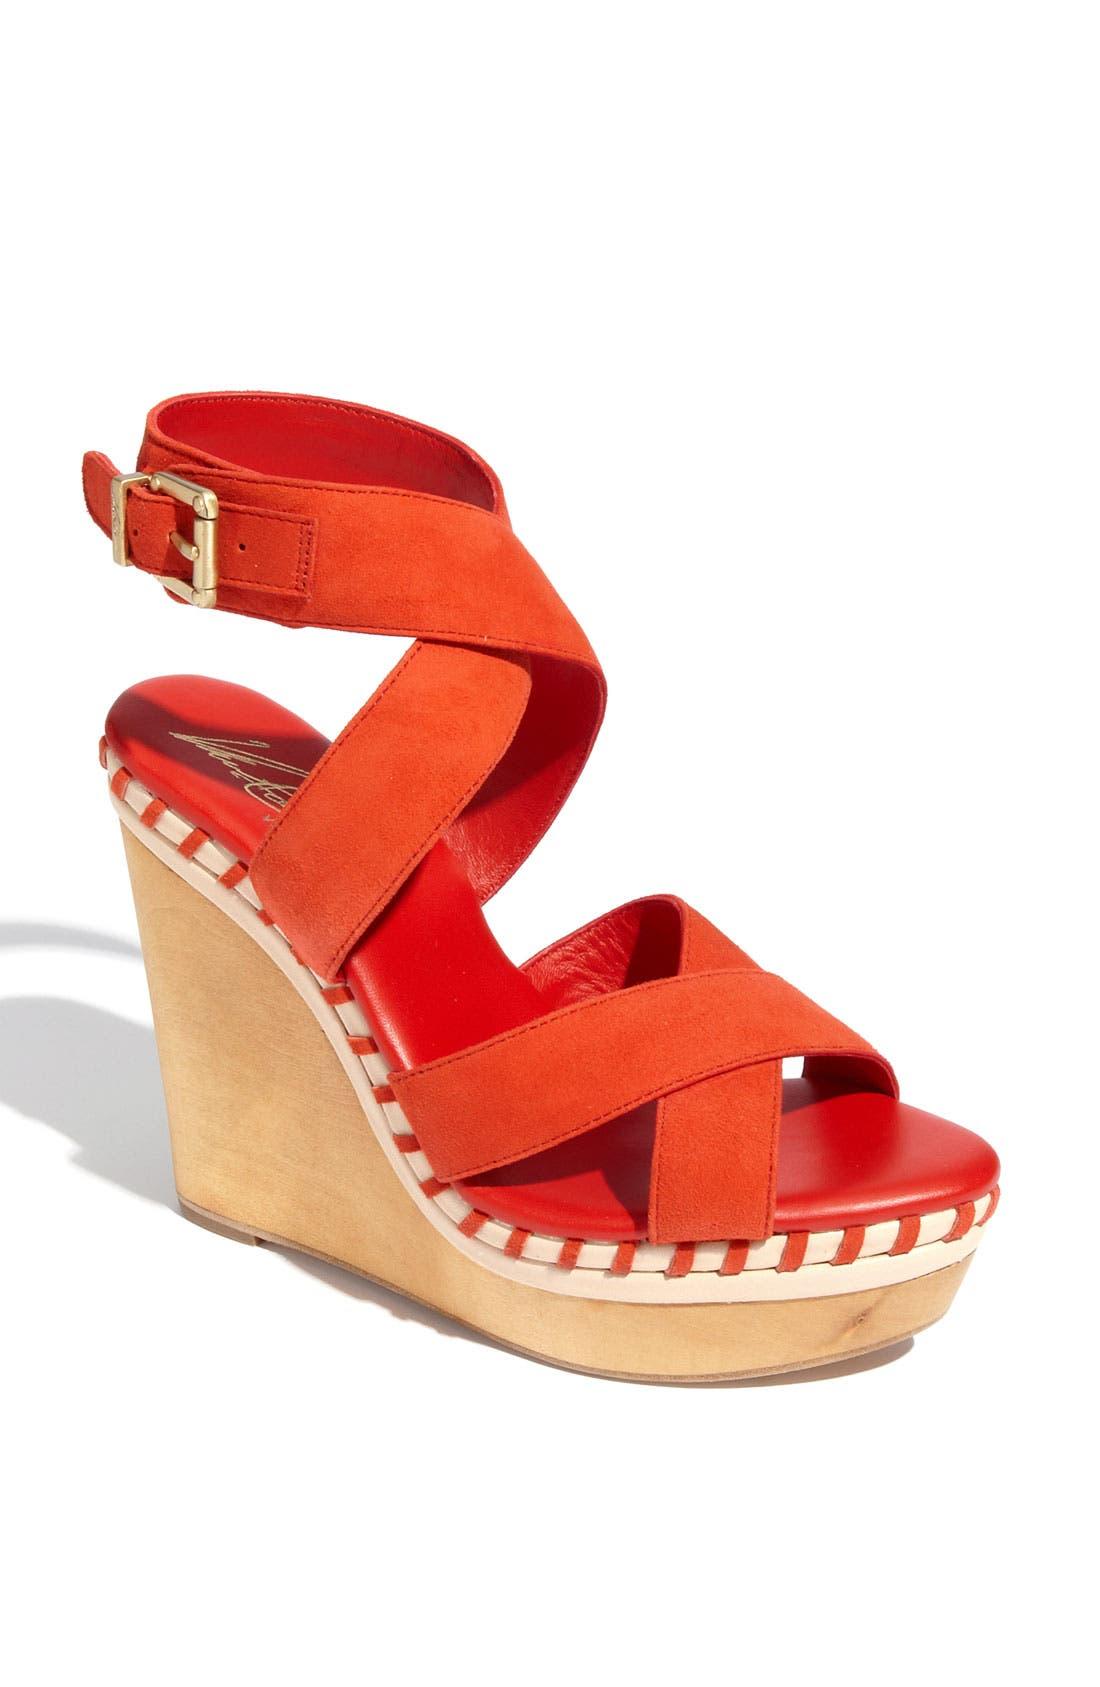 Main Image - VC Signature 'Lene' Sandal (Exclusive)